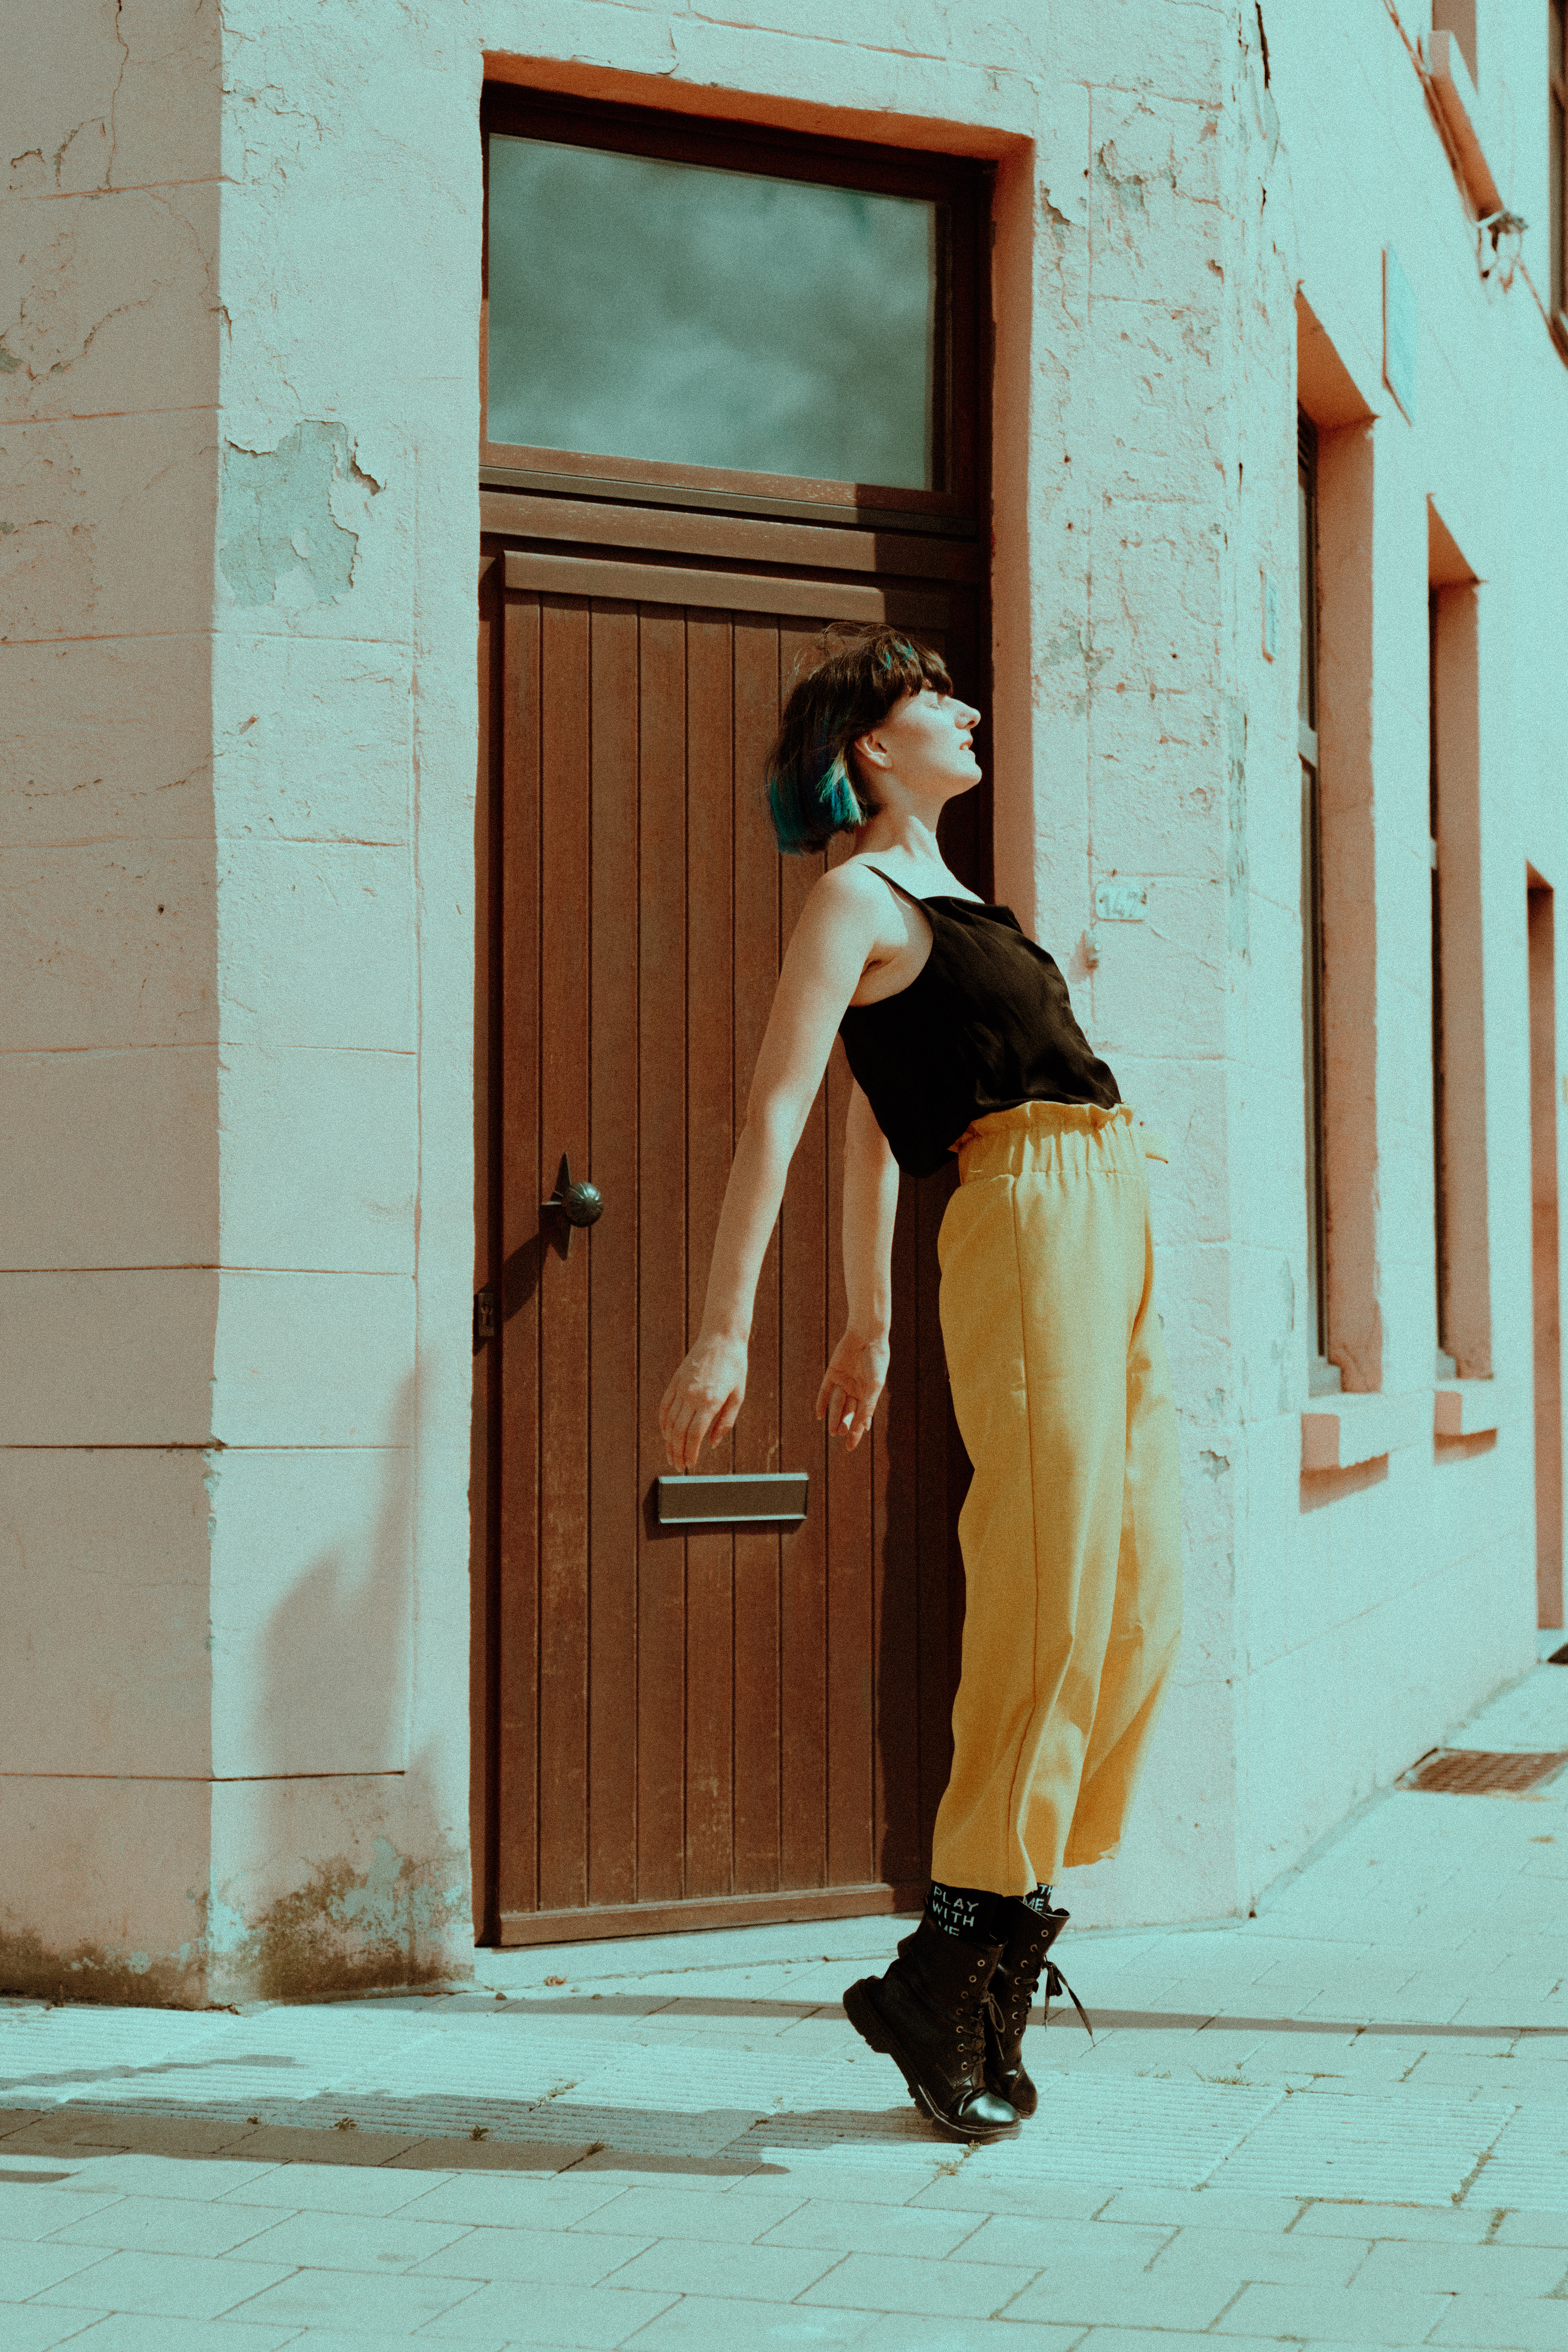 Juliaesphotographs - Saartje Van Den Haute - @artofastridaryajeanna